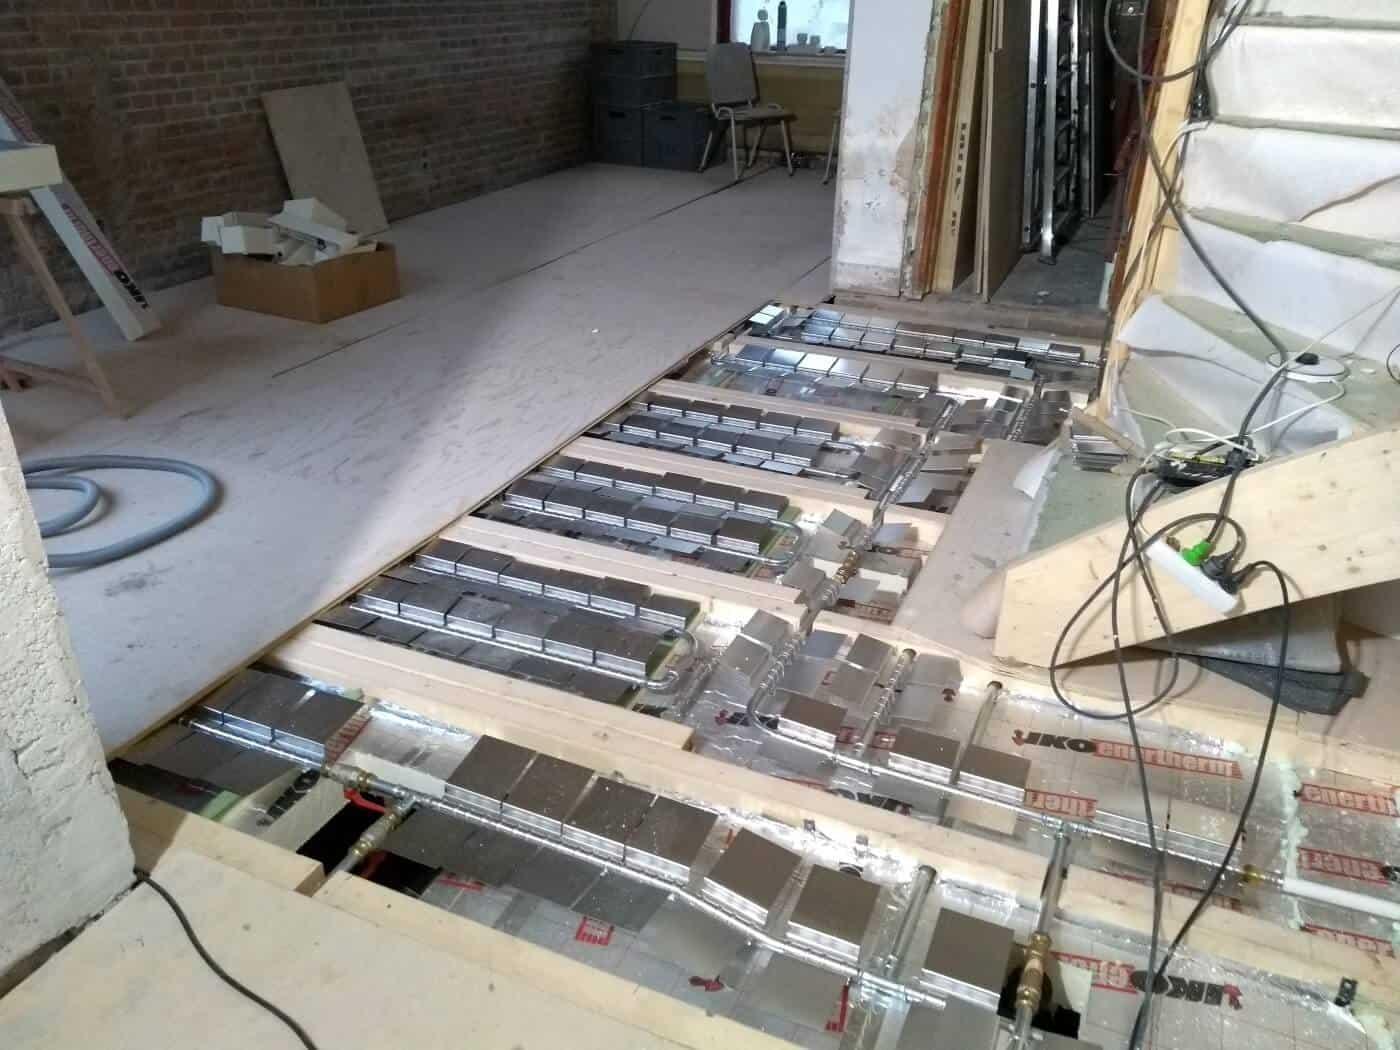 Deria vloerverwarmingssyteem verbouwing Den Haag